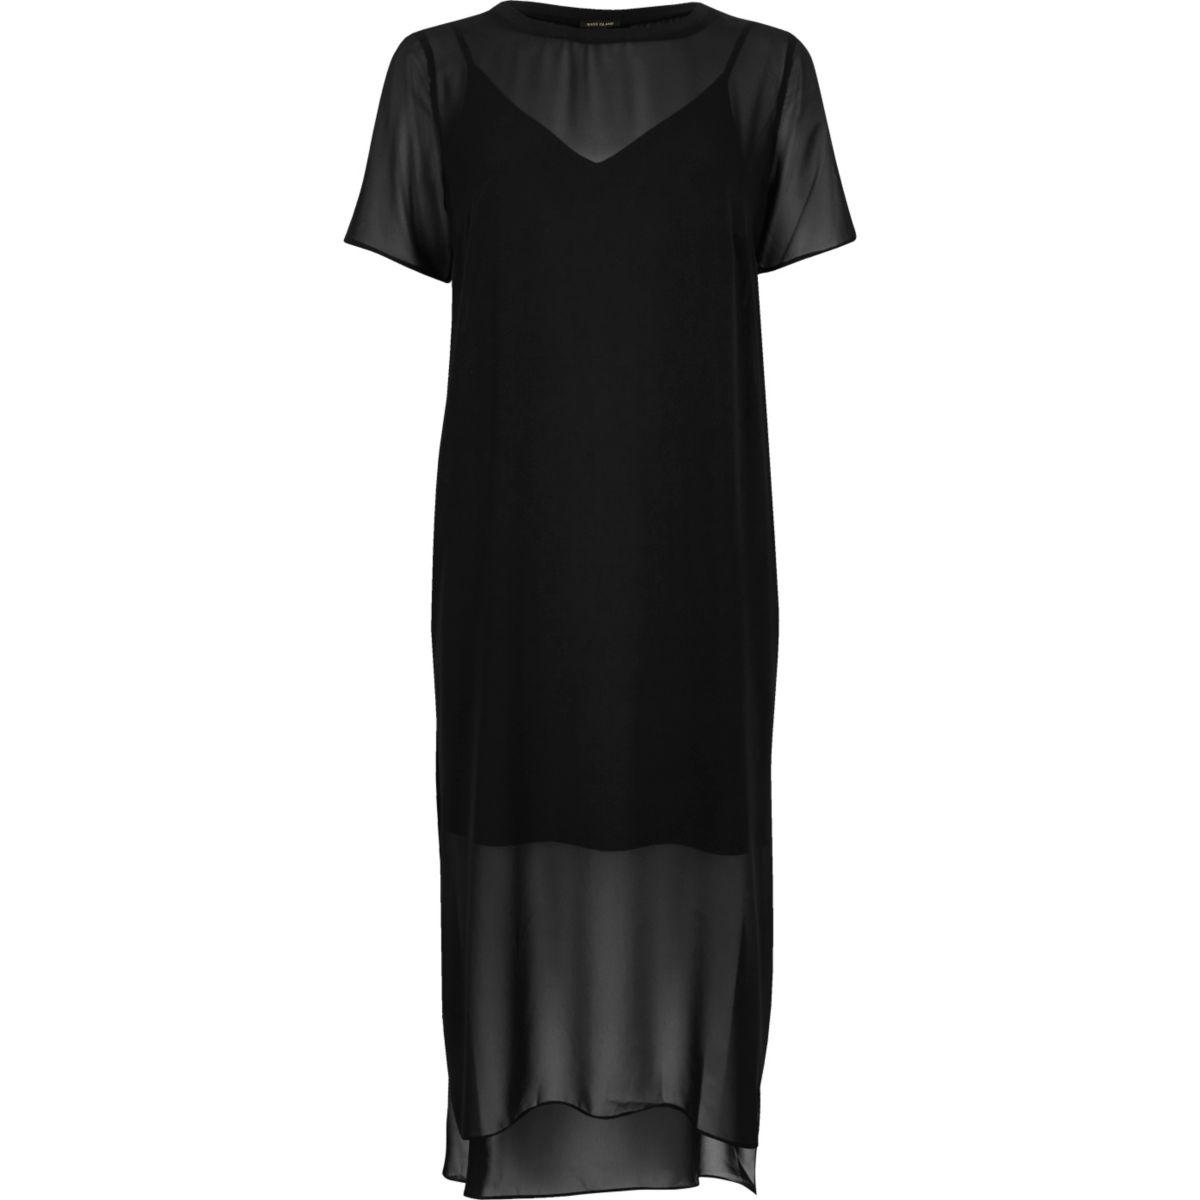 Zwarte T-shirt midi-jurk van mesh